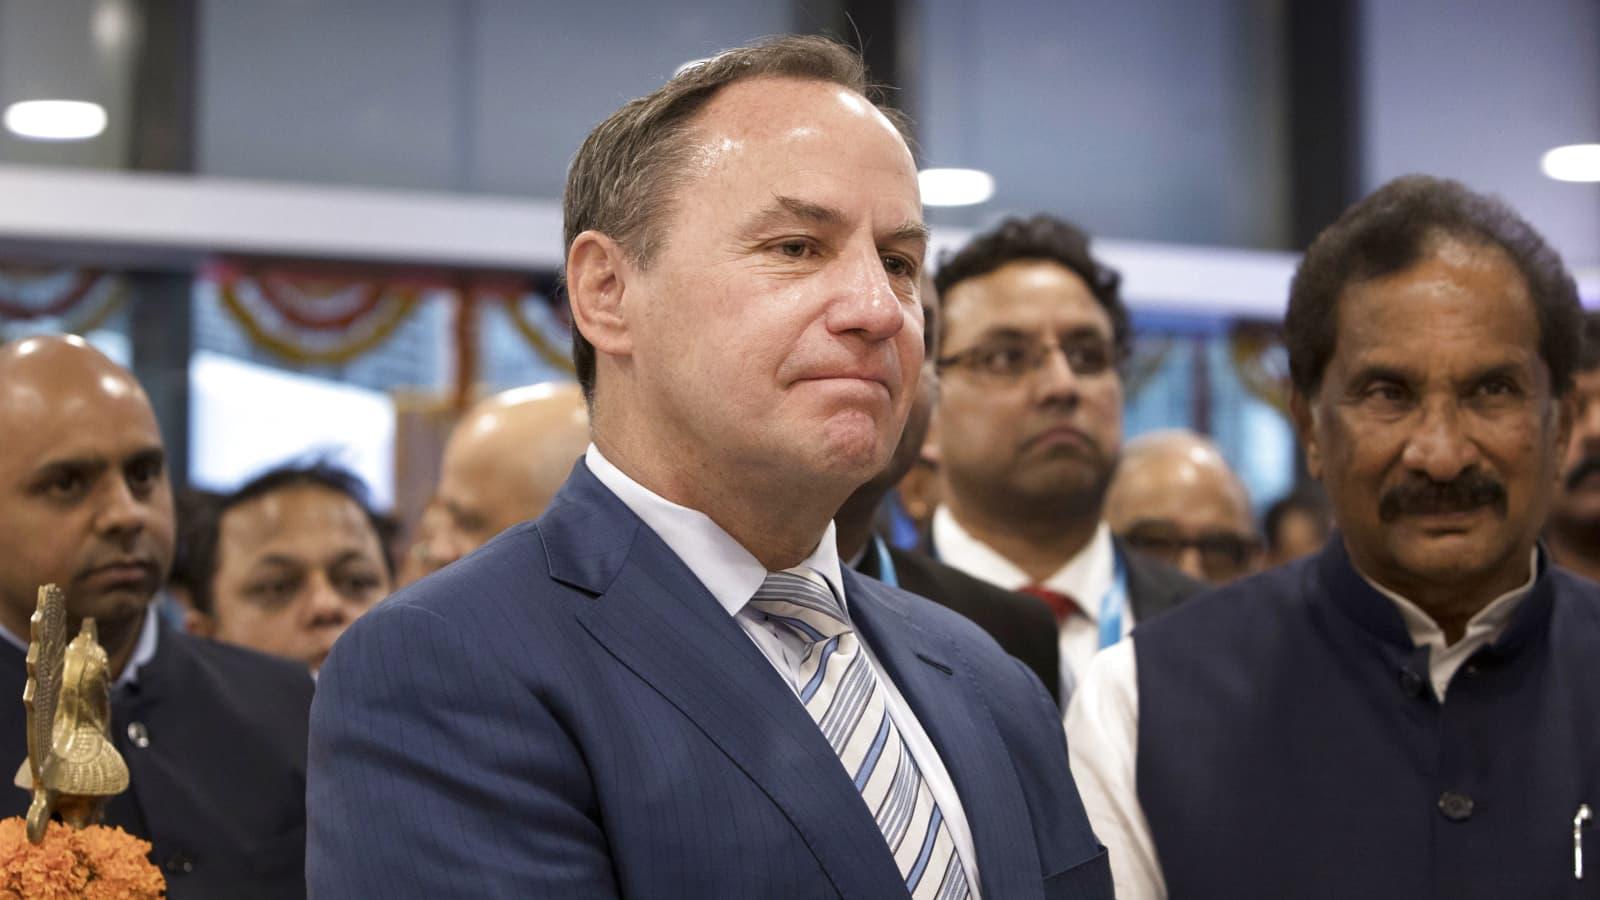 Intel names Robert Swan as CEO